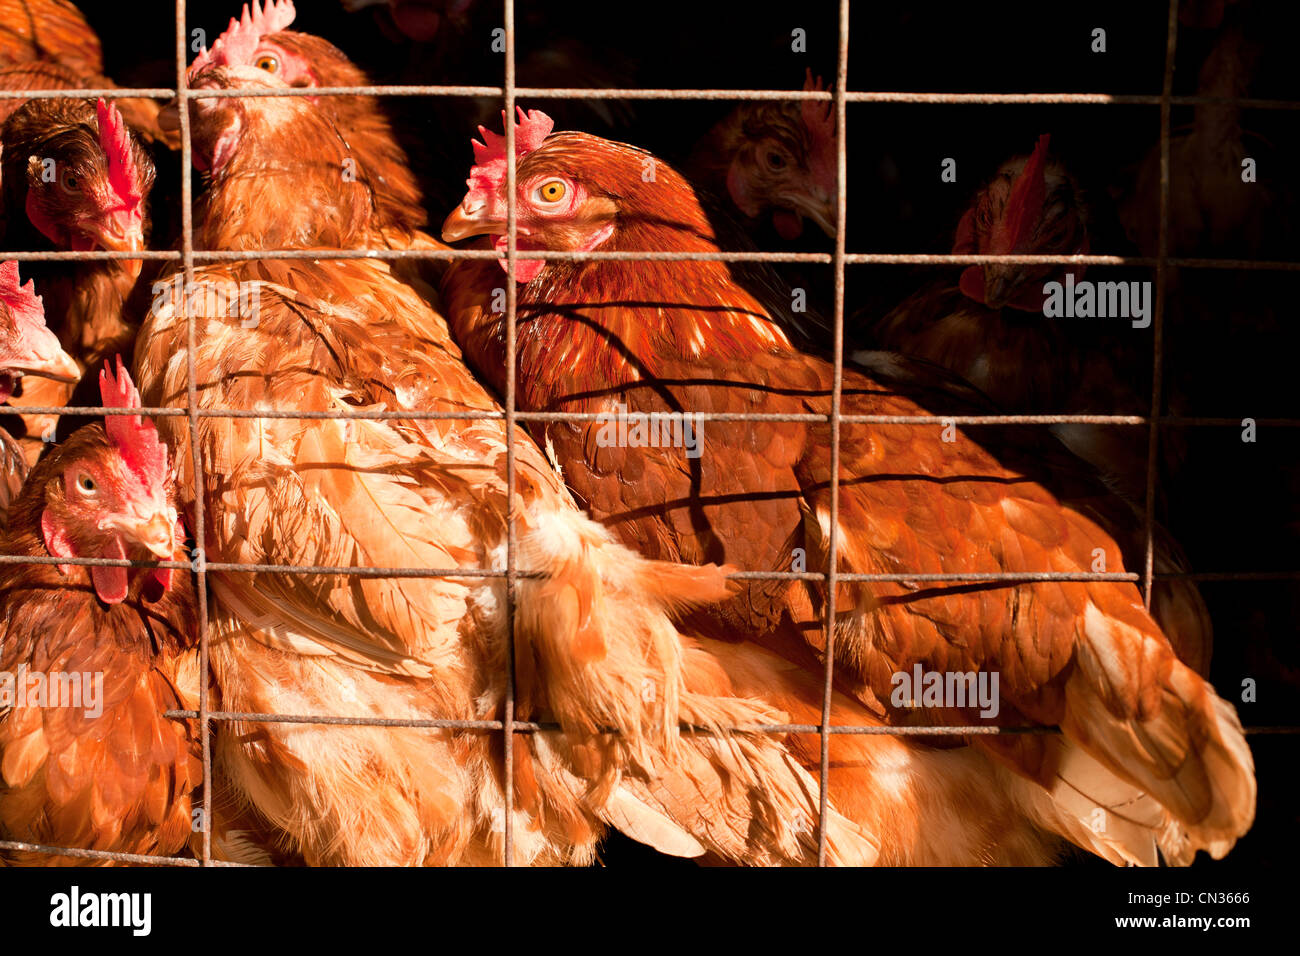 Hens - Stock Image